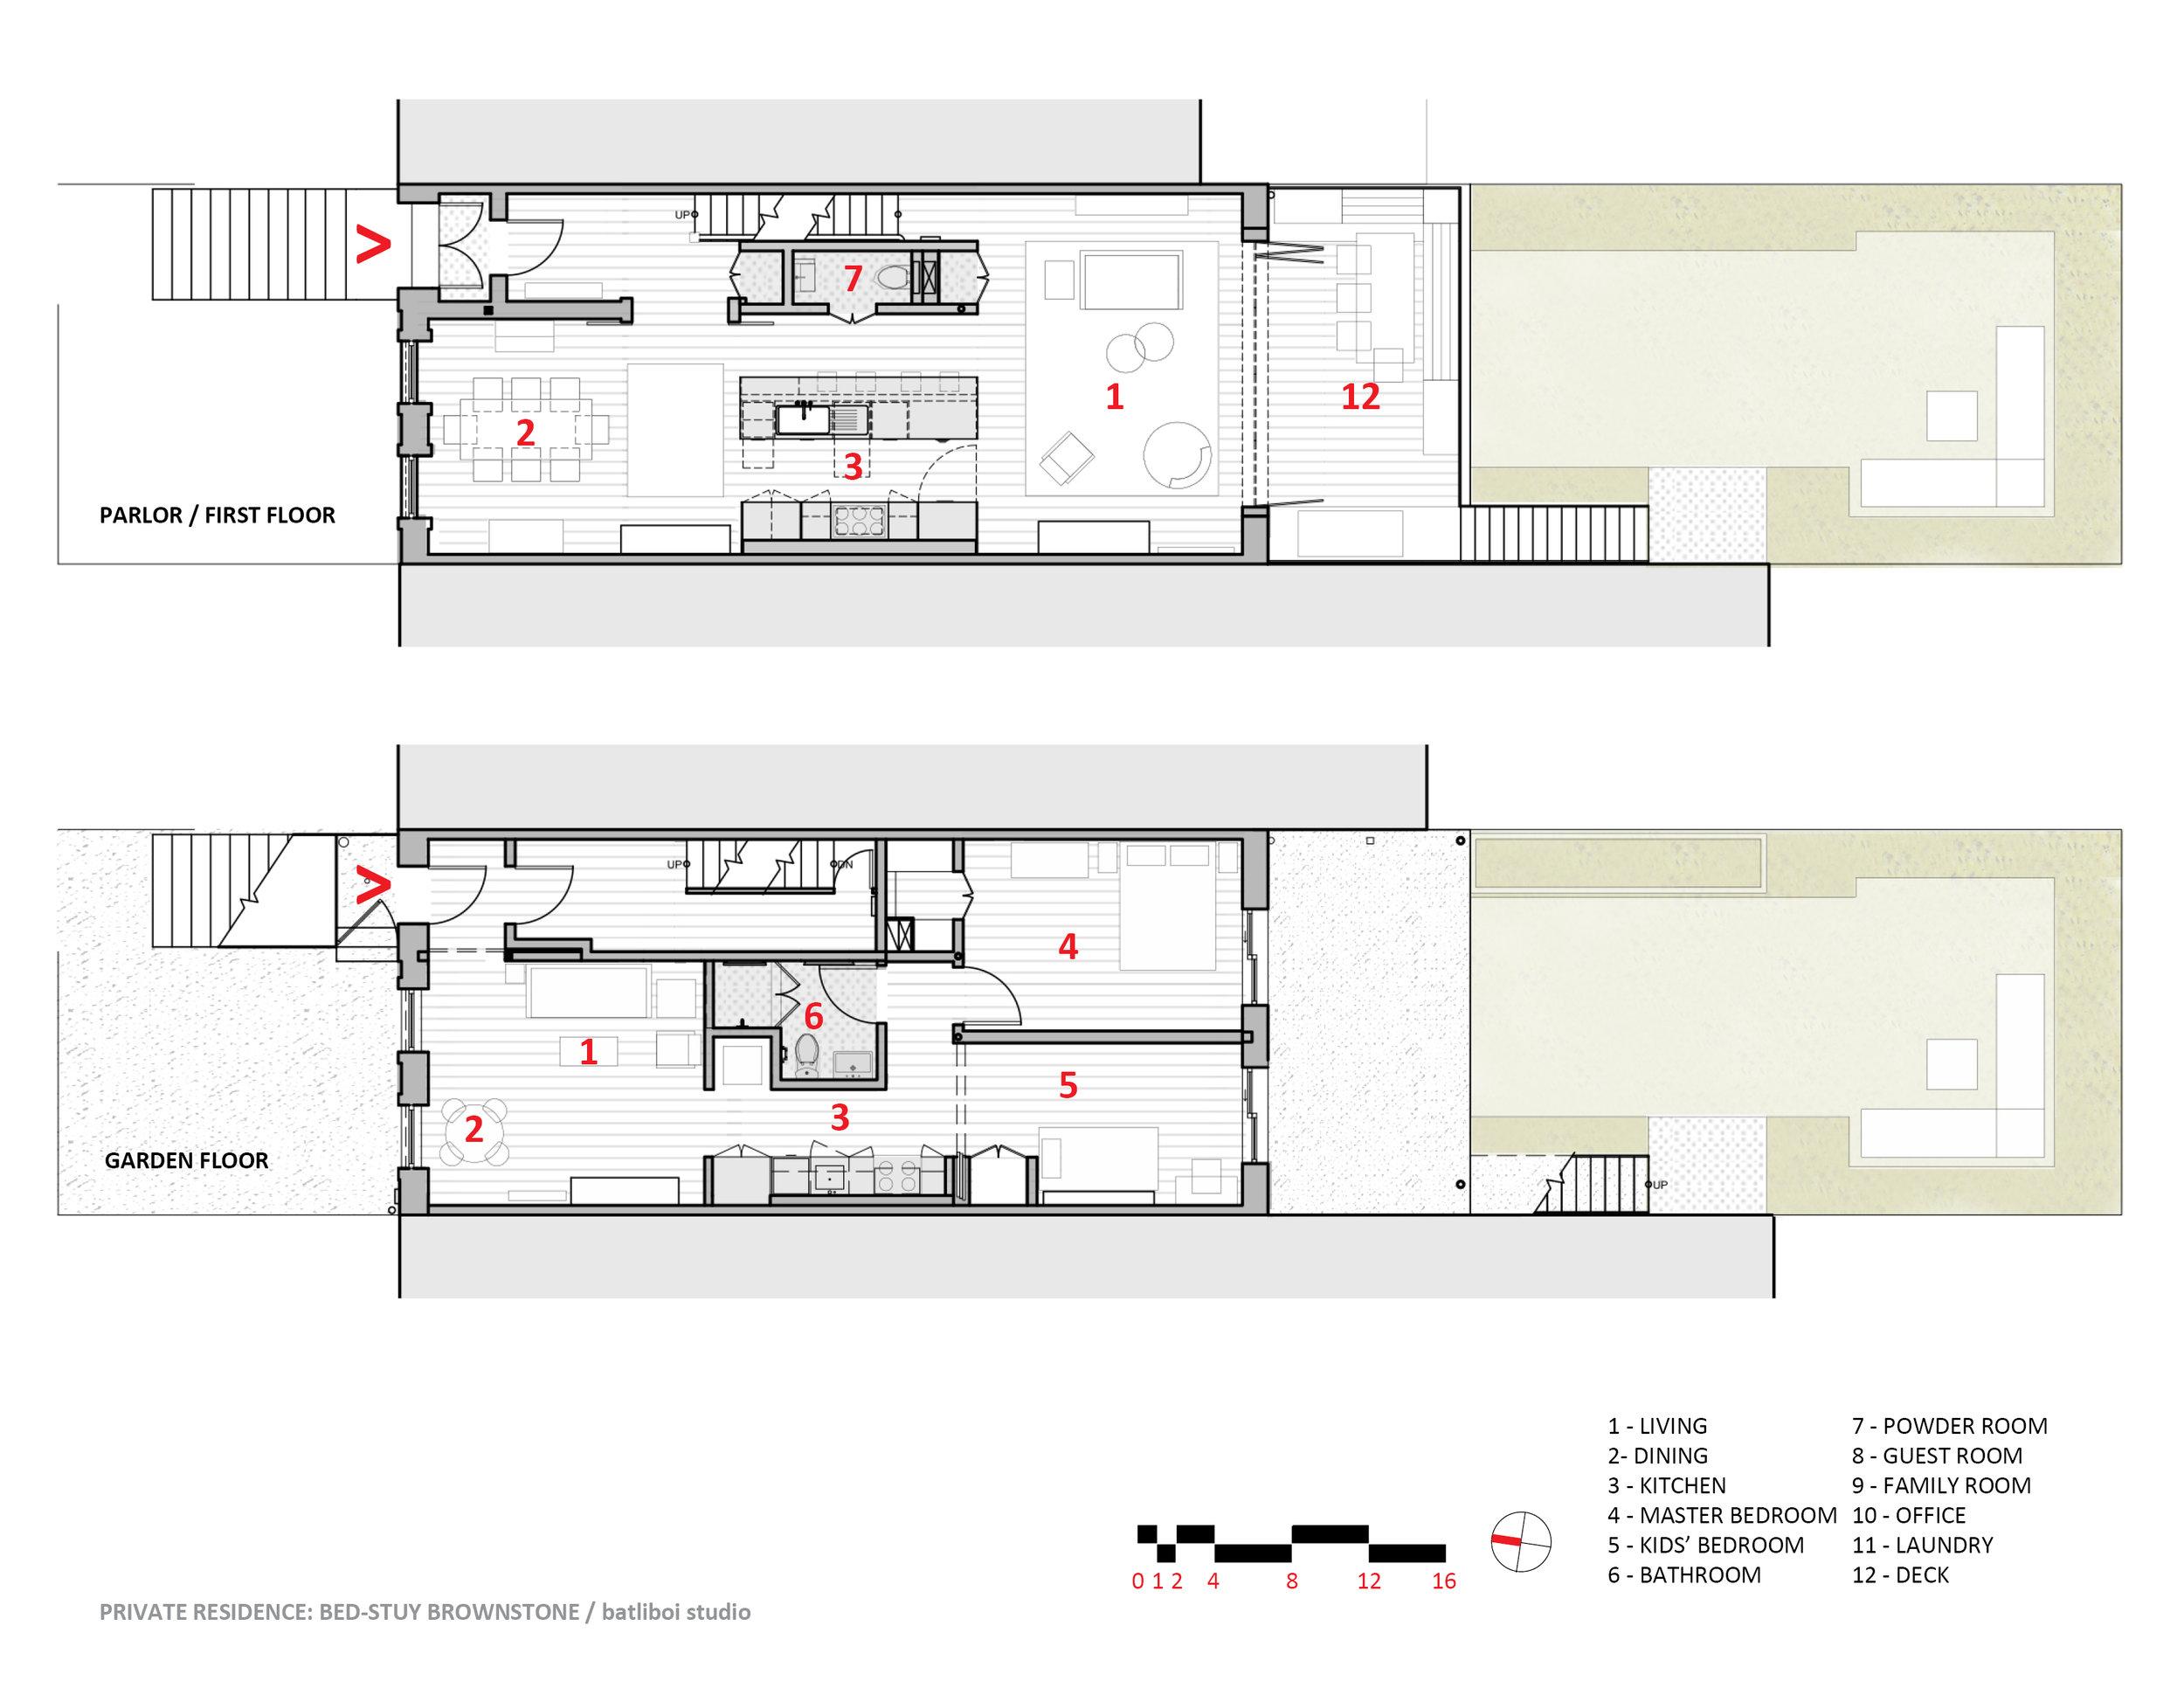 Bed-Stuy townhouse - plans 5.jpg